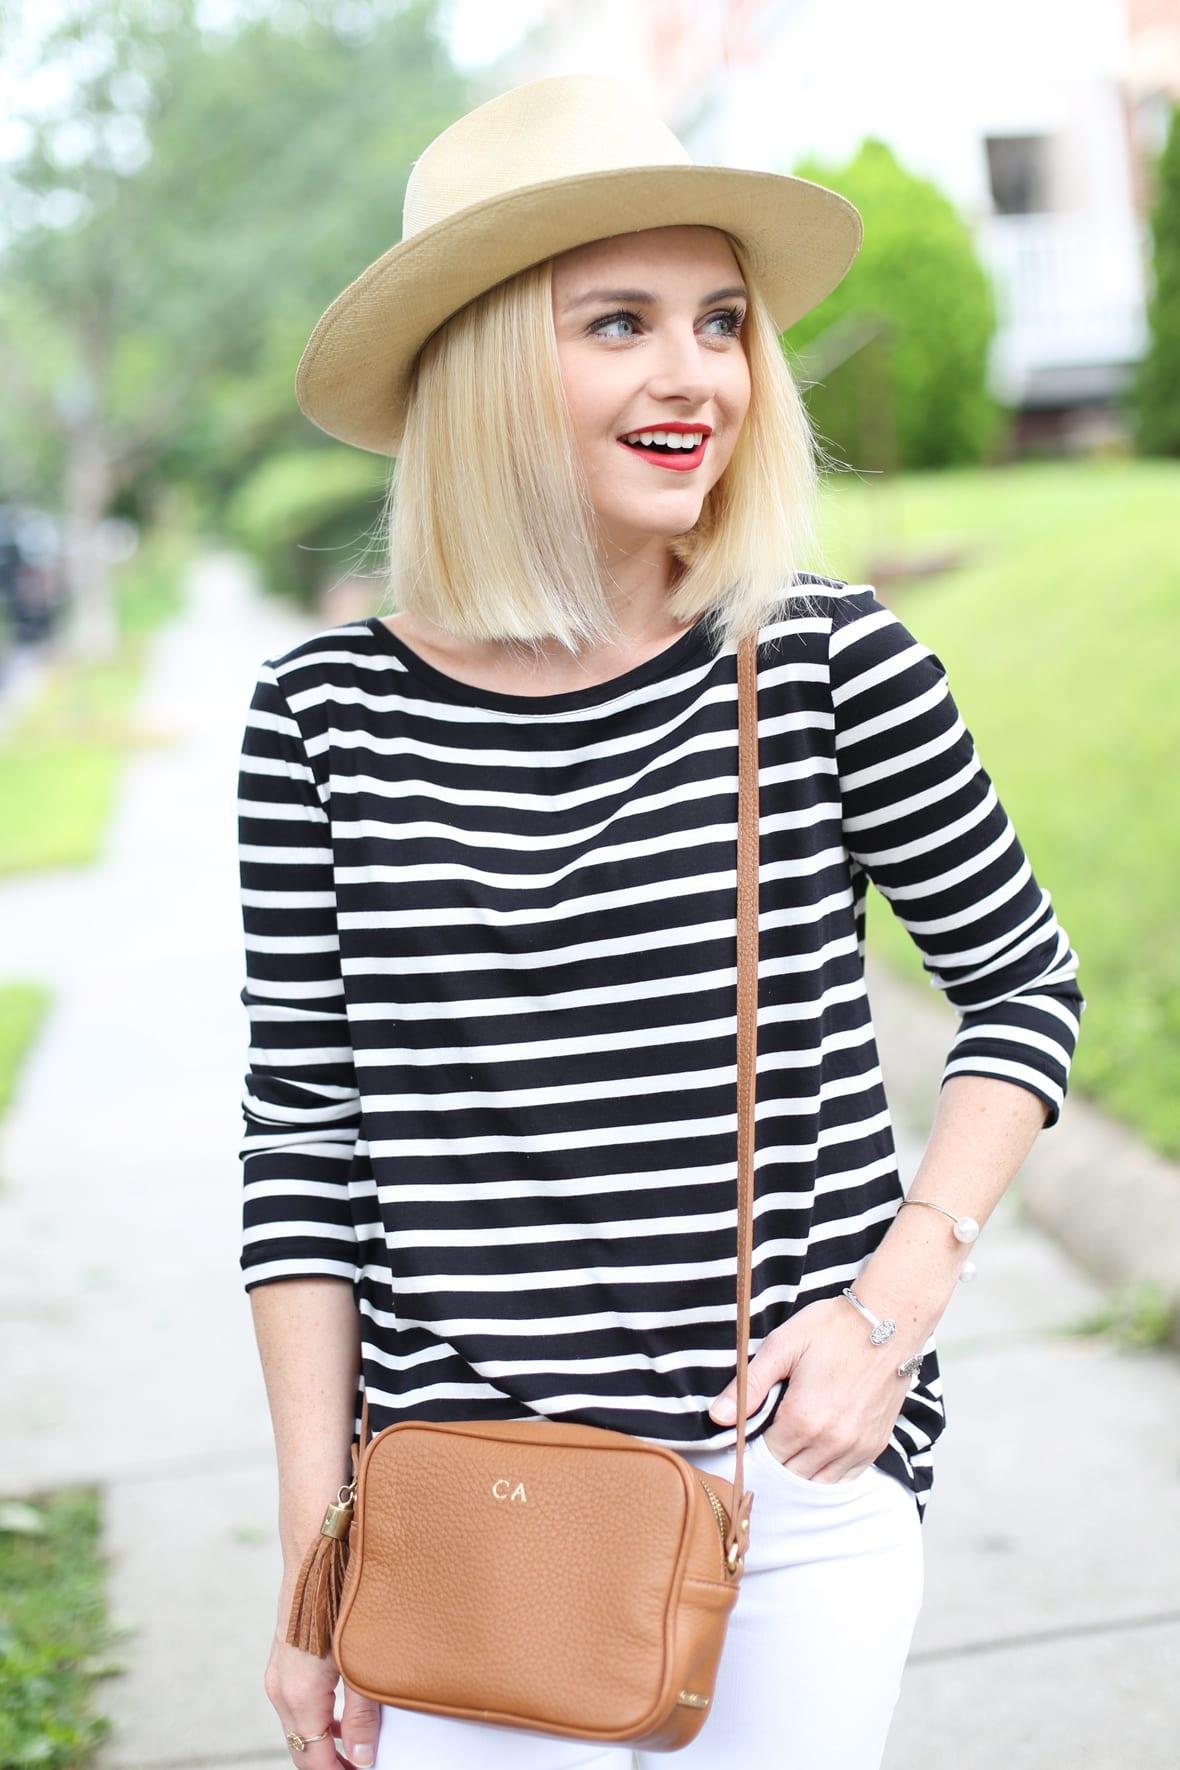 Black and White Striped Tee on Poor Little It Girl - via @poorlilitgirl